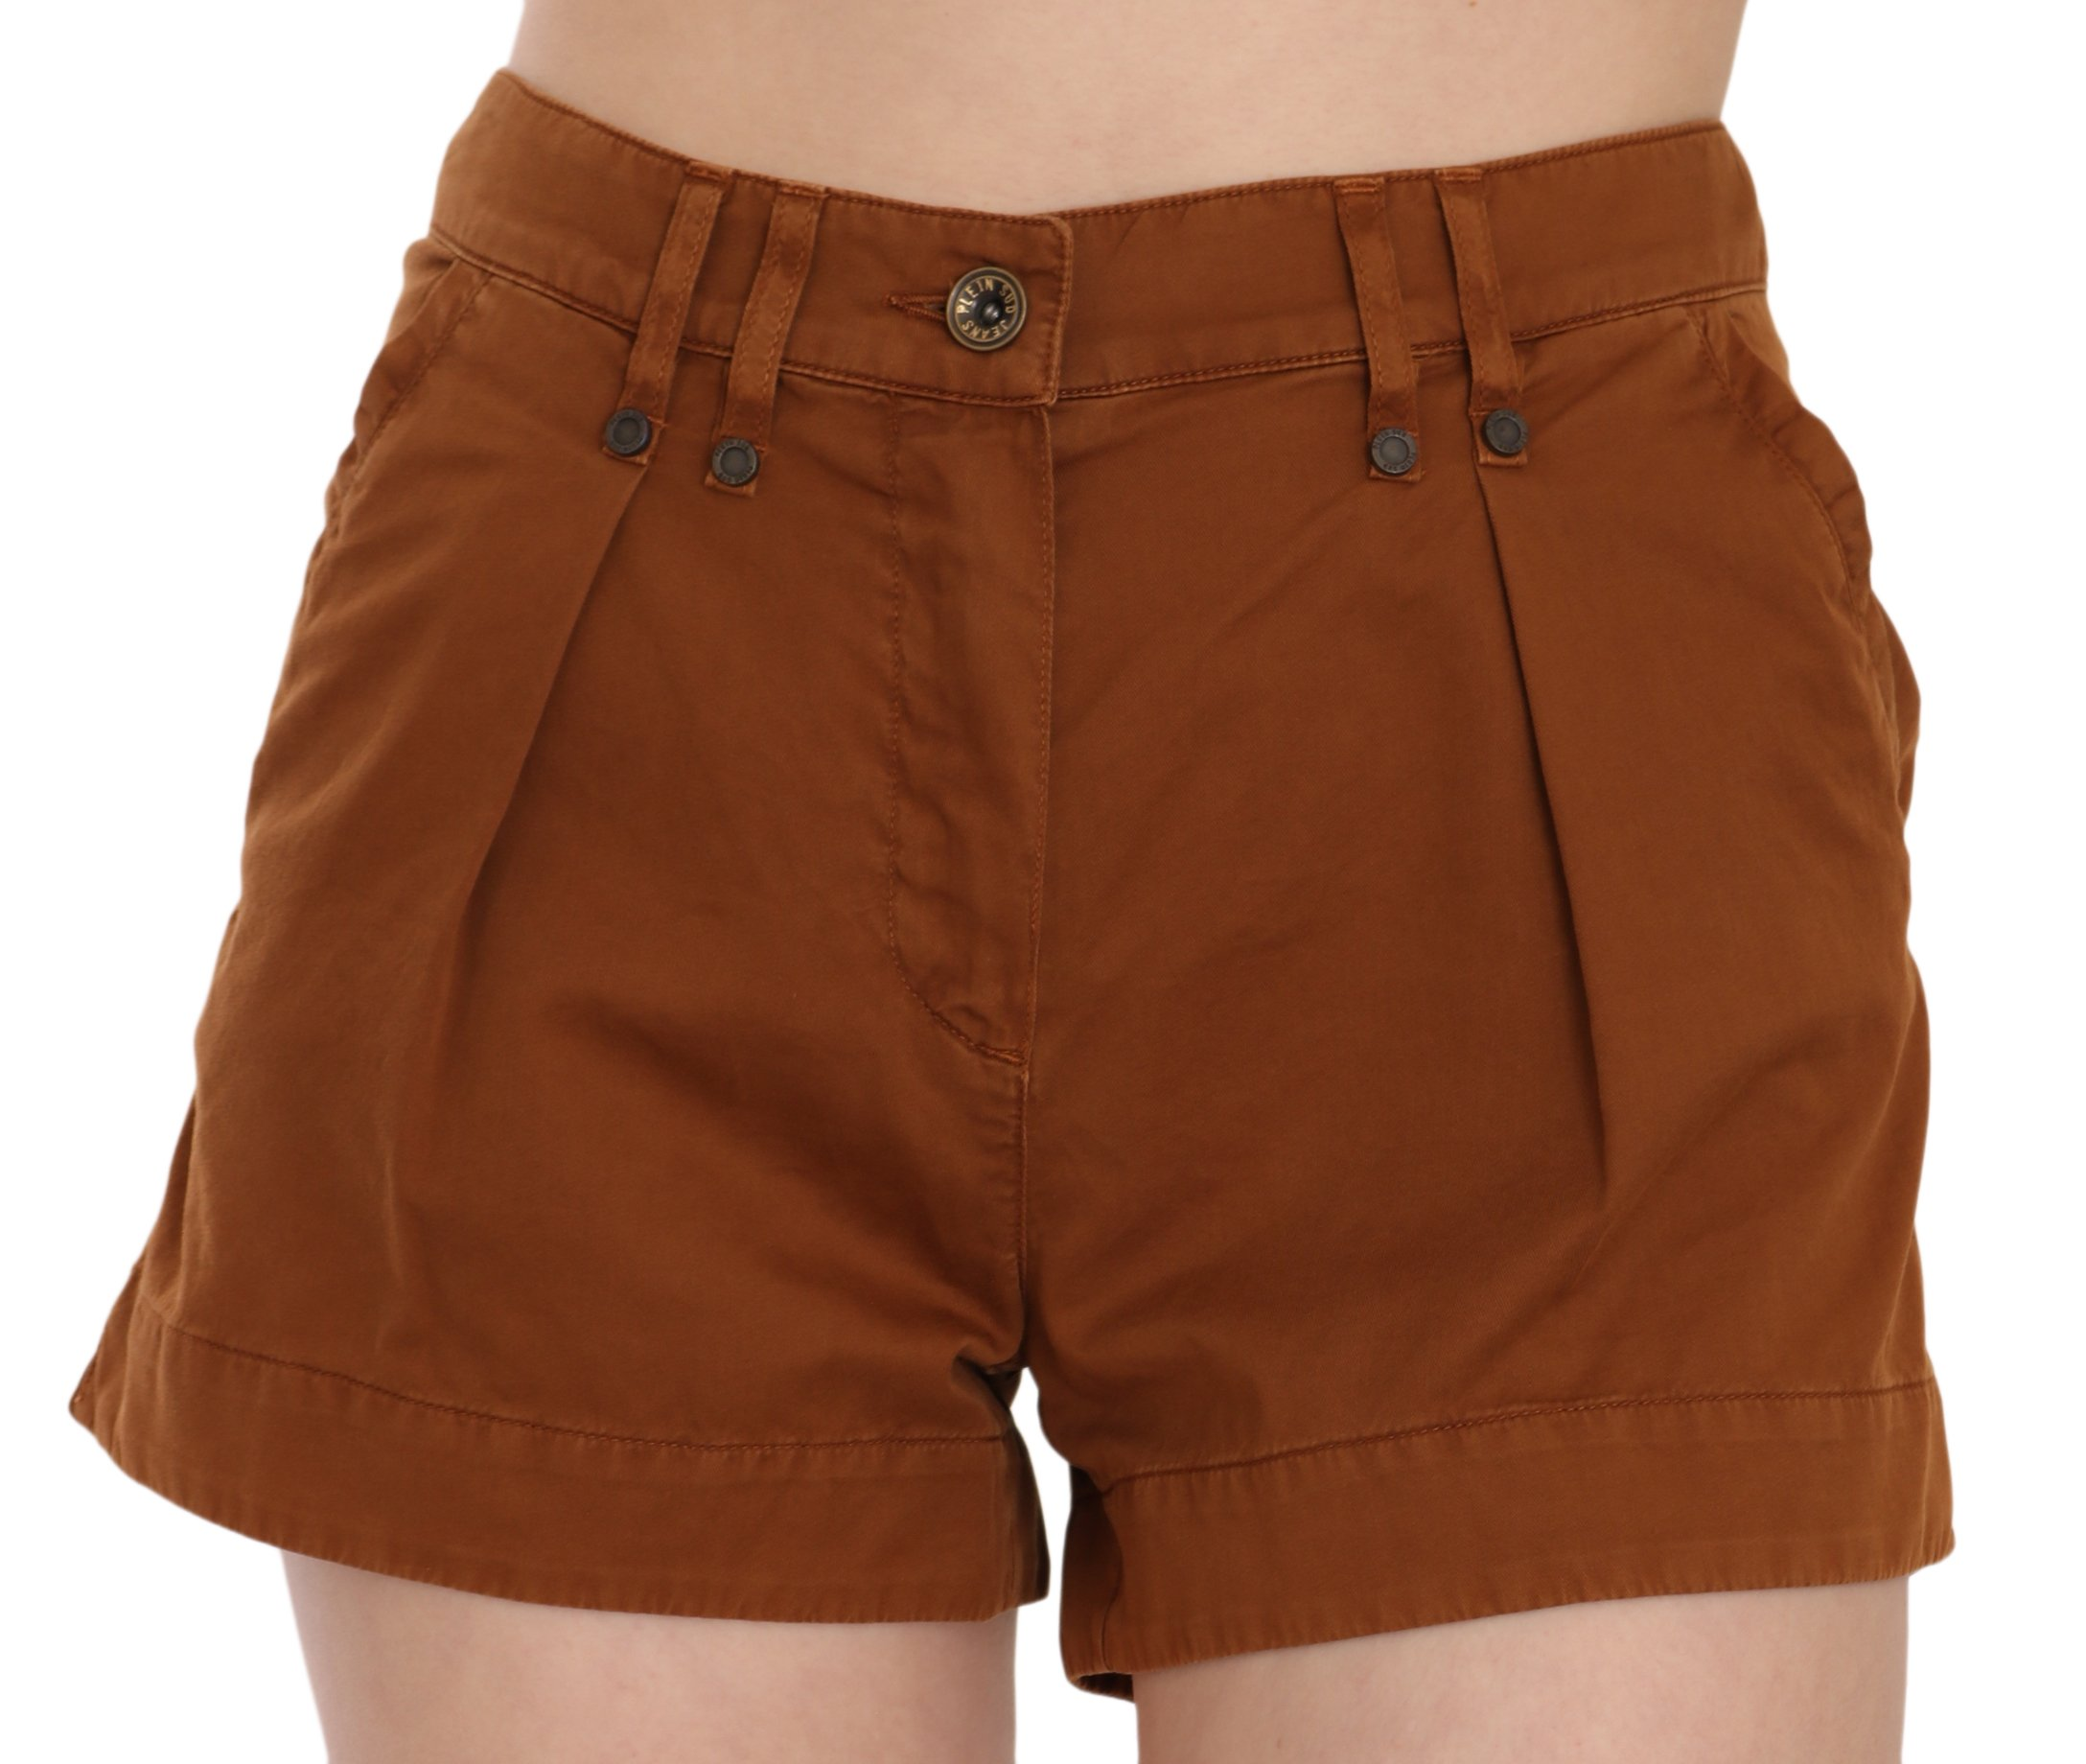 PLEIN SUD Women's Mid Waist Cotton Denim Mini Shorts Brown PAN70250 - IT38|XS